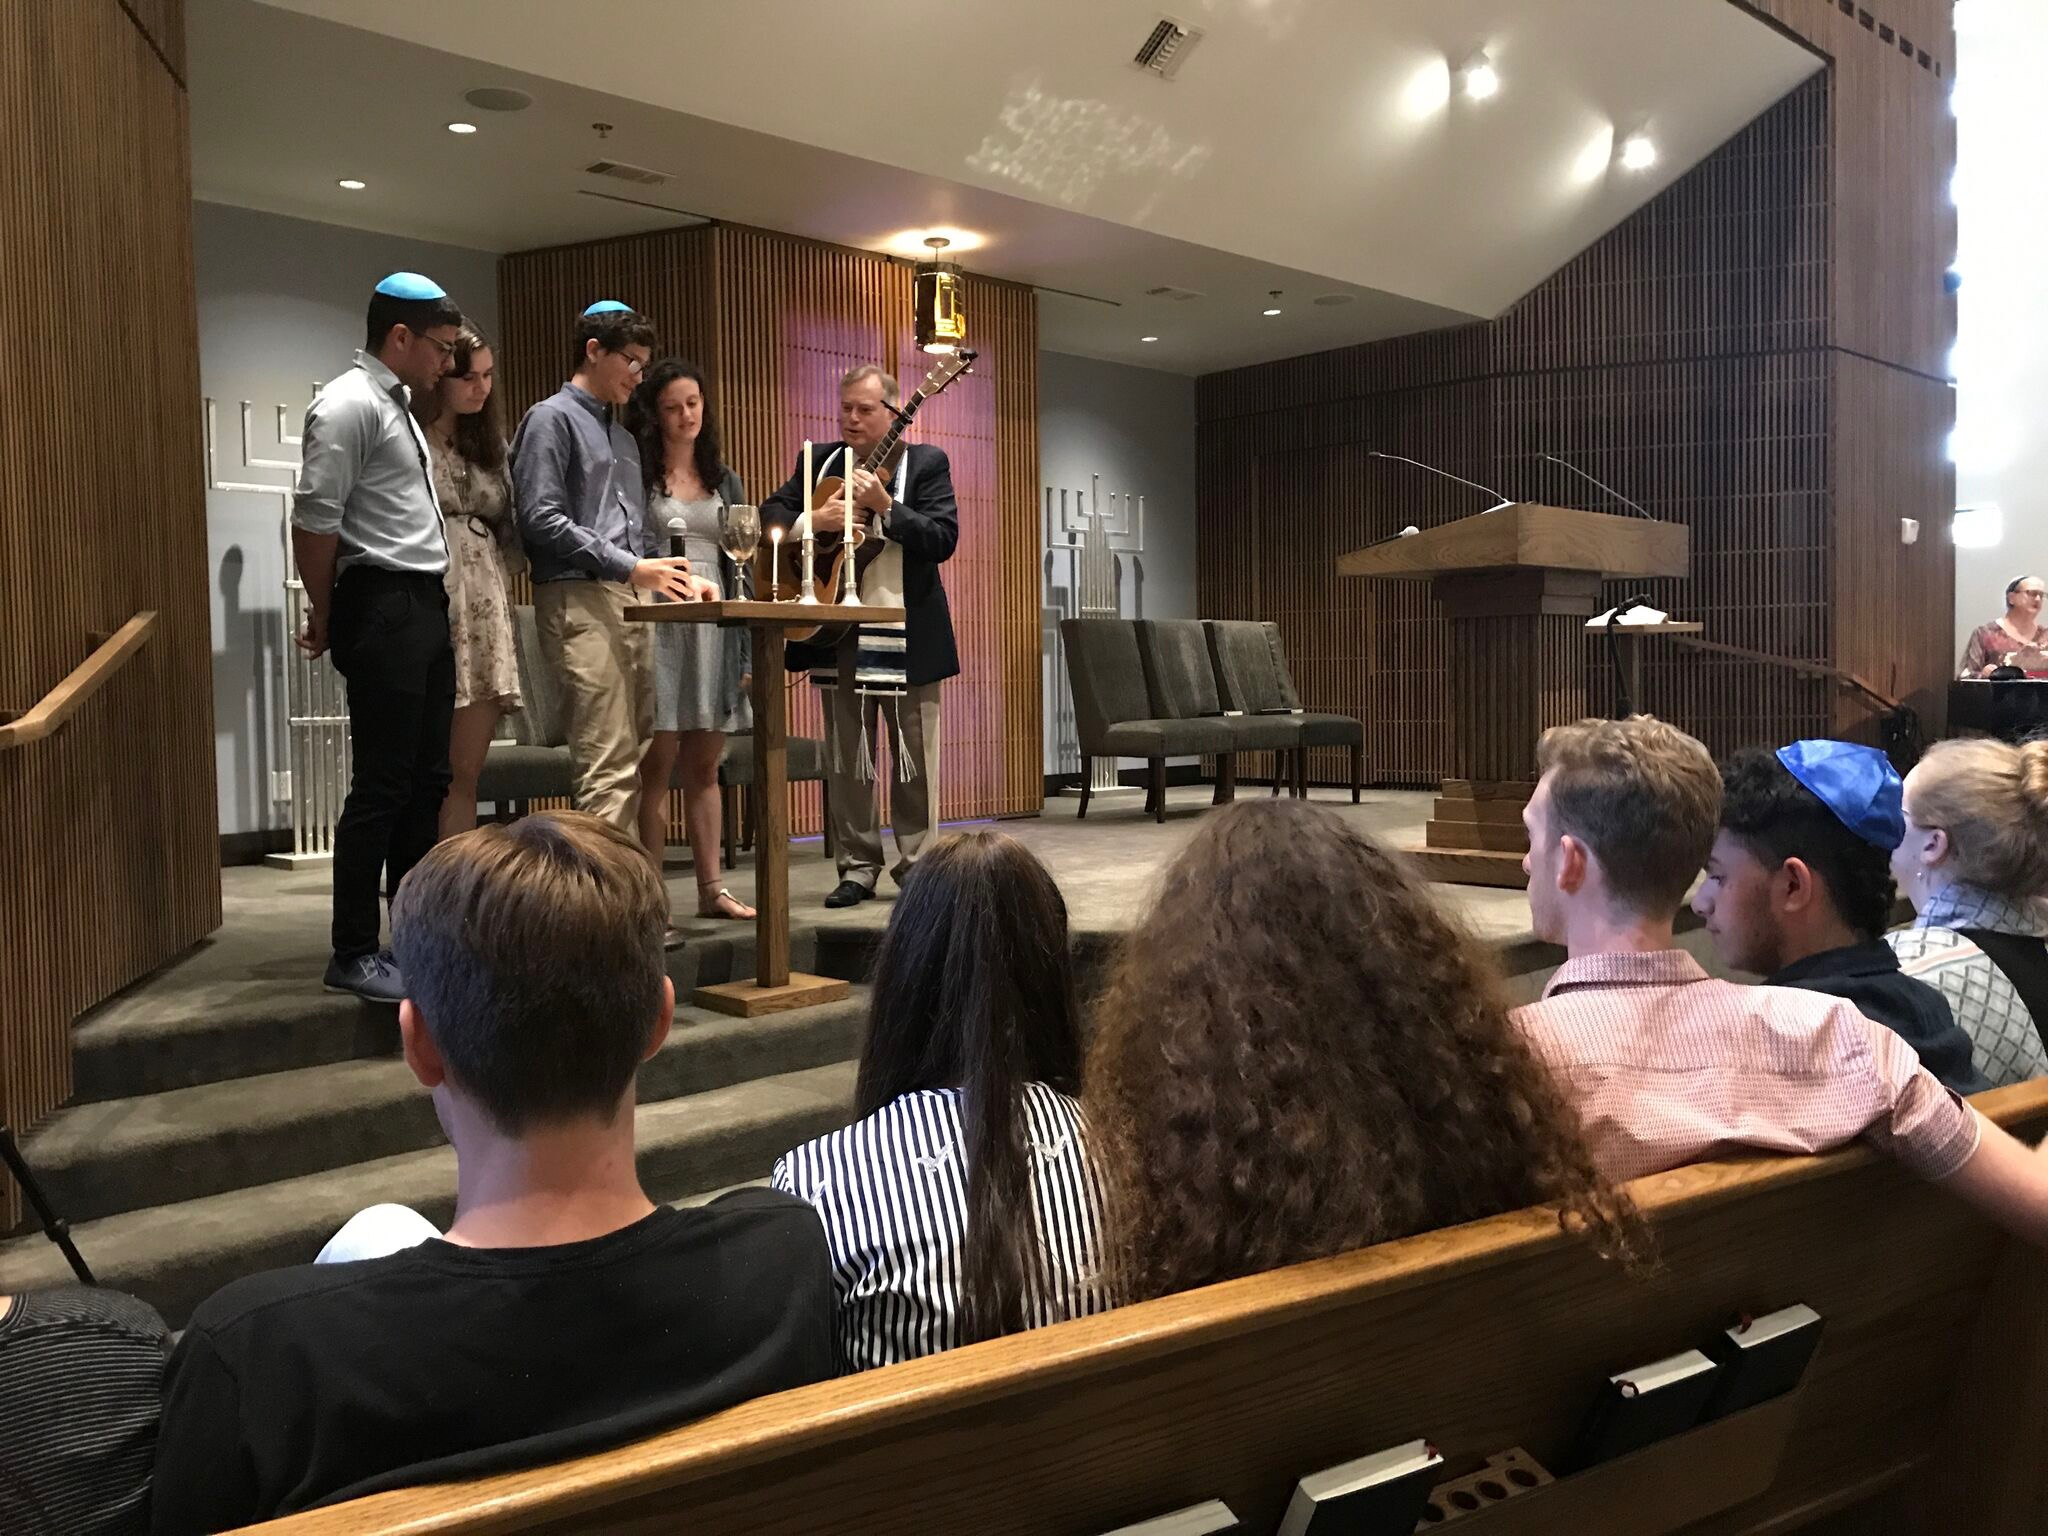 Celebrating Shabbat at the HCRJ